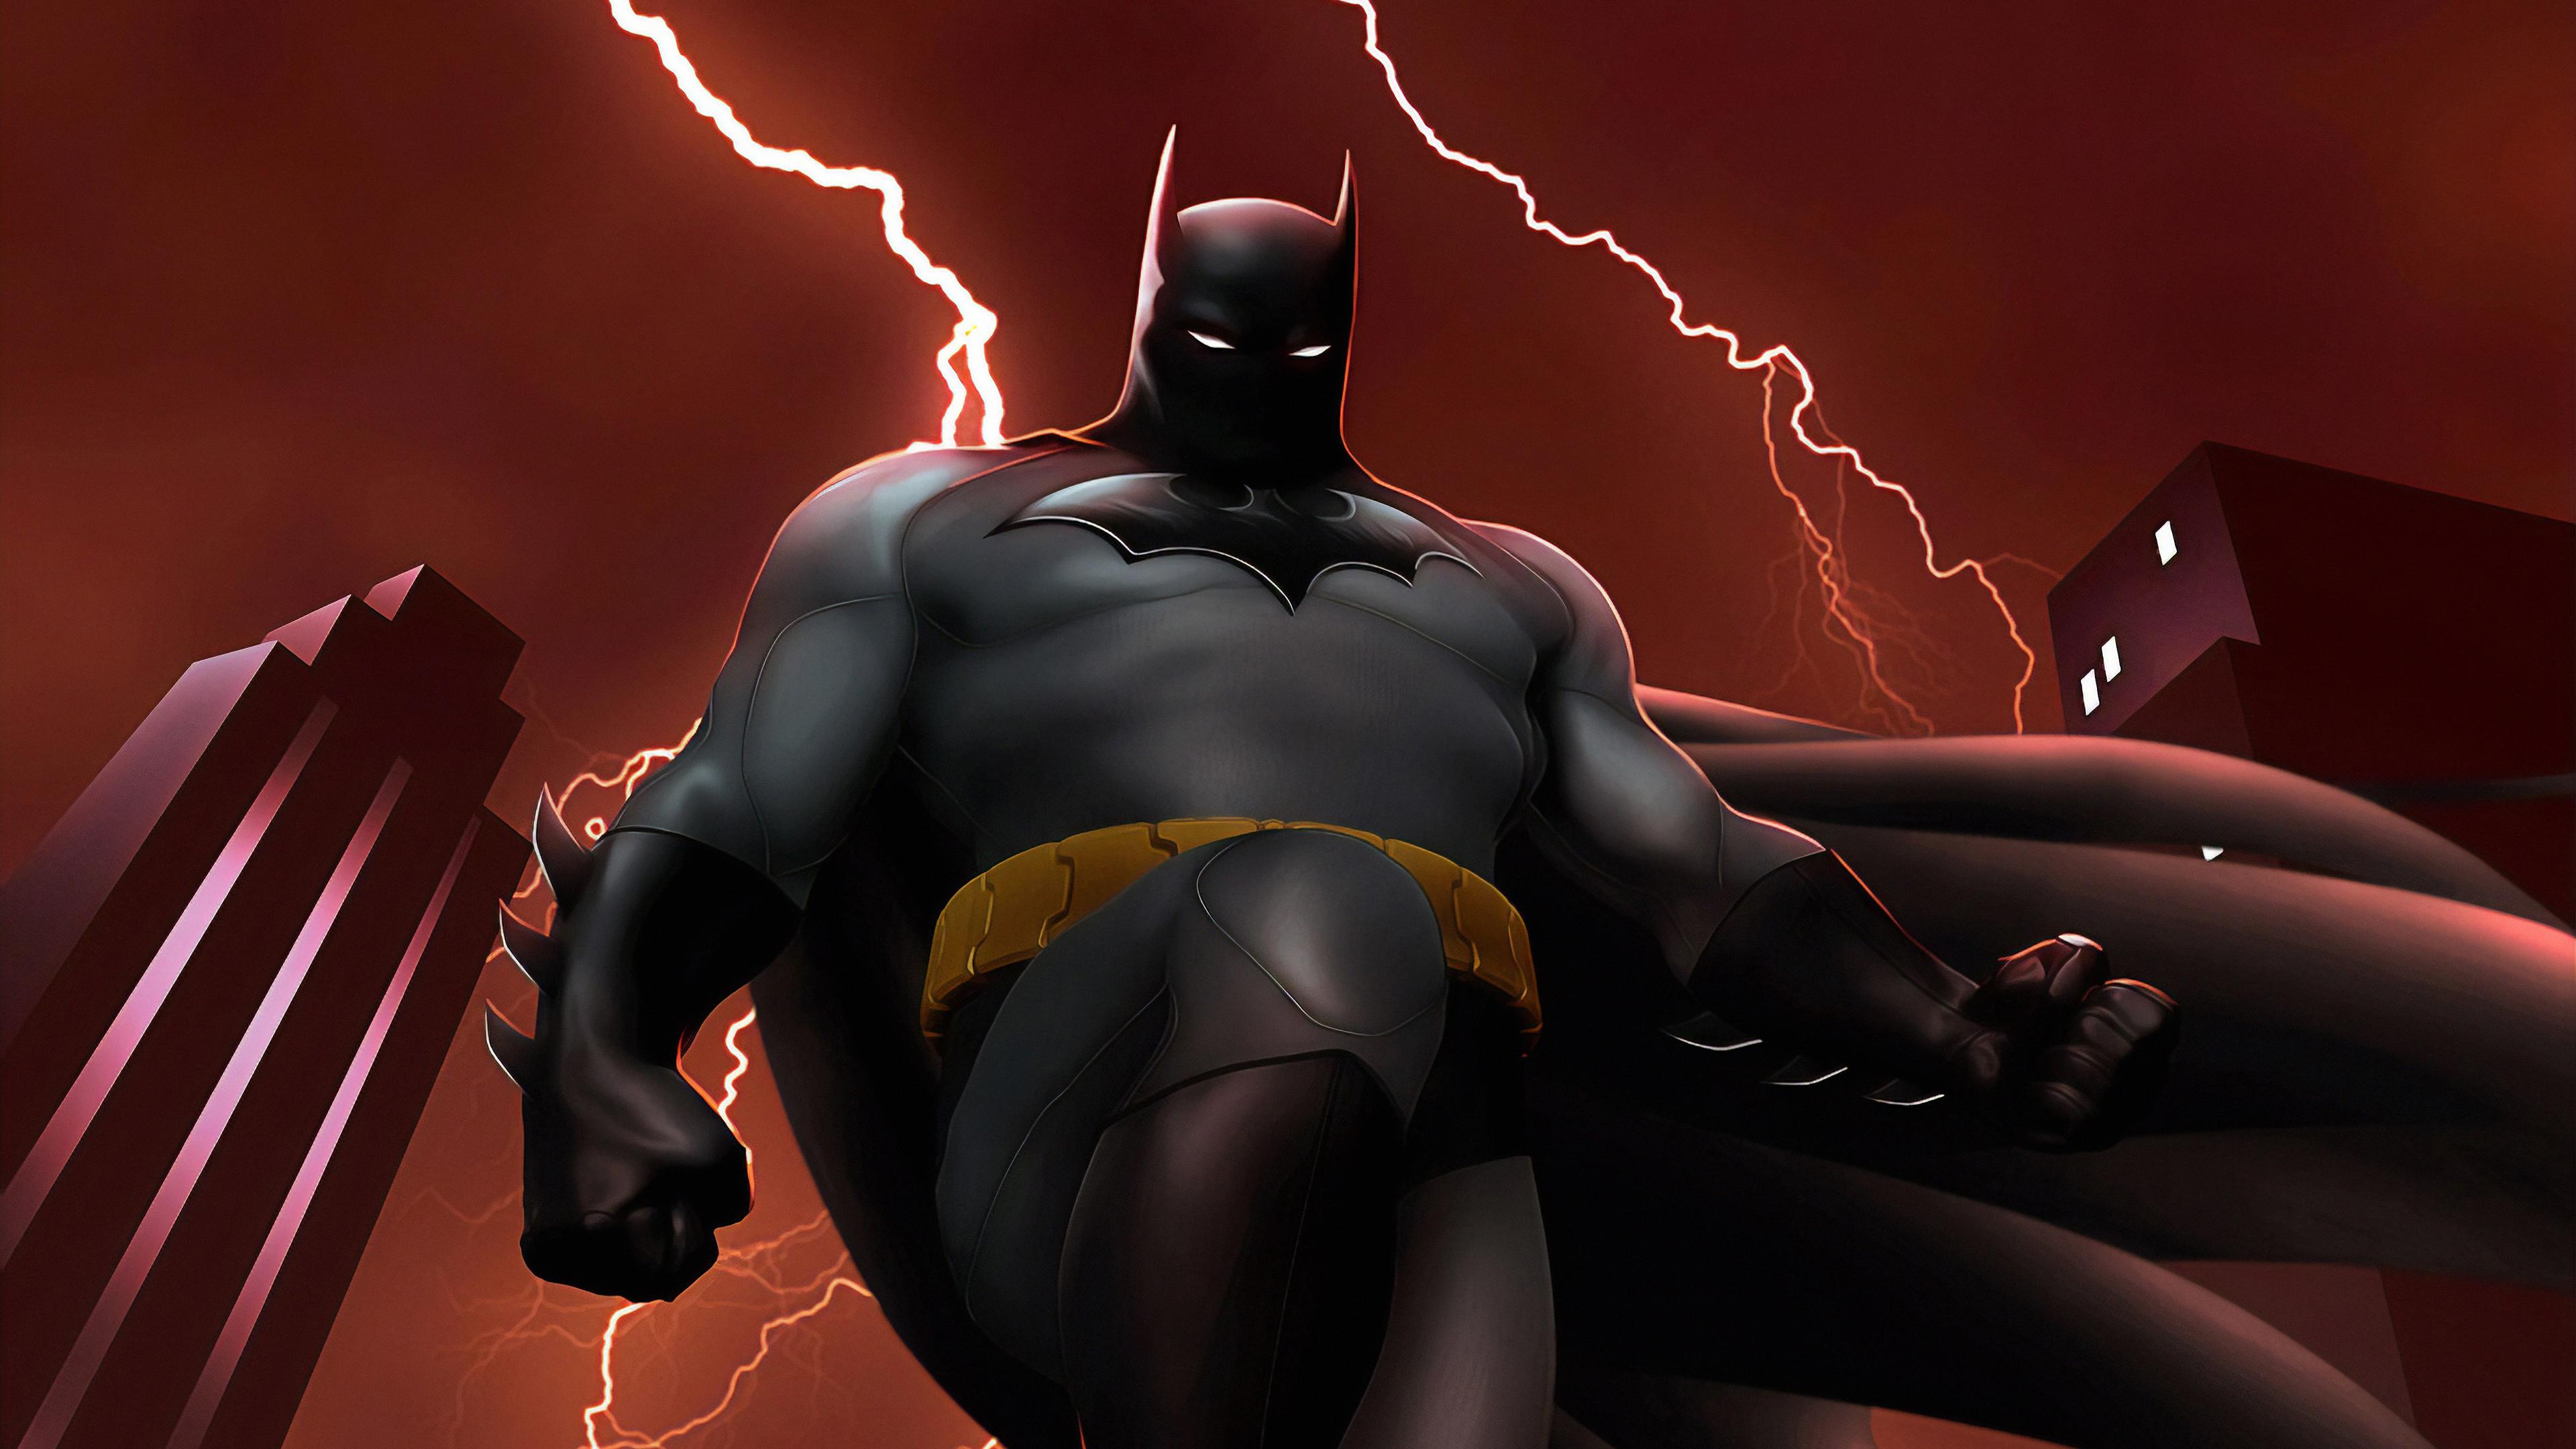 batman 2019 1570394263 - Batman 2019 - superheroes wallpapers, hd-wallpapers, digital art wallpapers, batman wallpapers, artwork wallpapers, artstation wallpapers, 4k-wallpapers